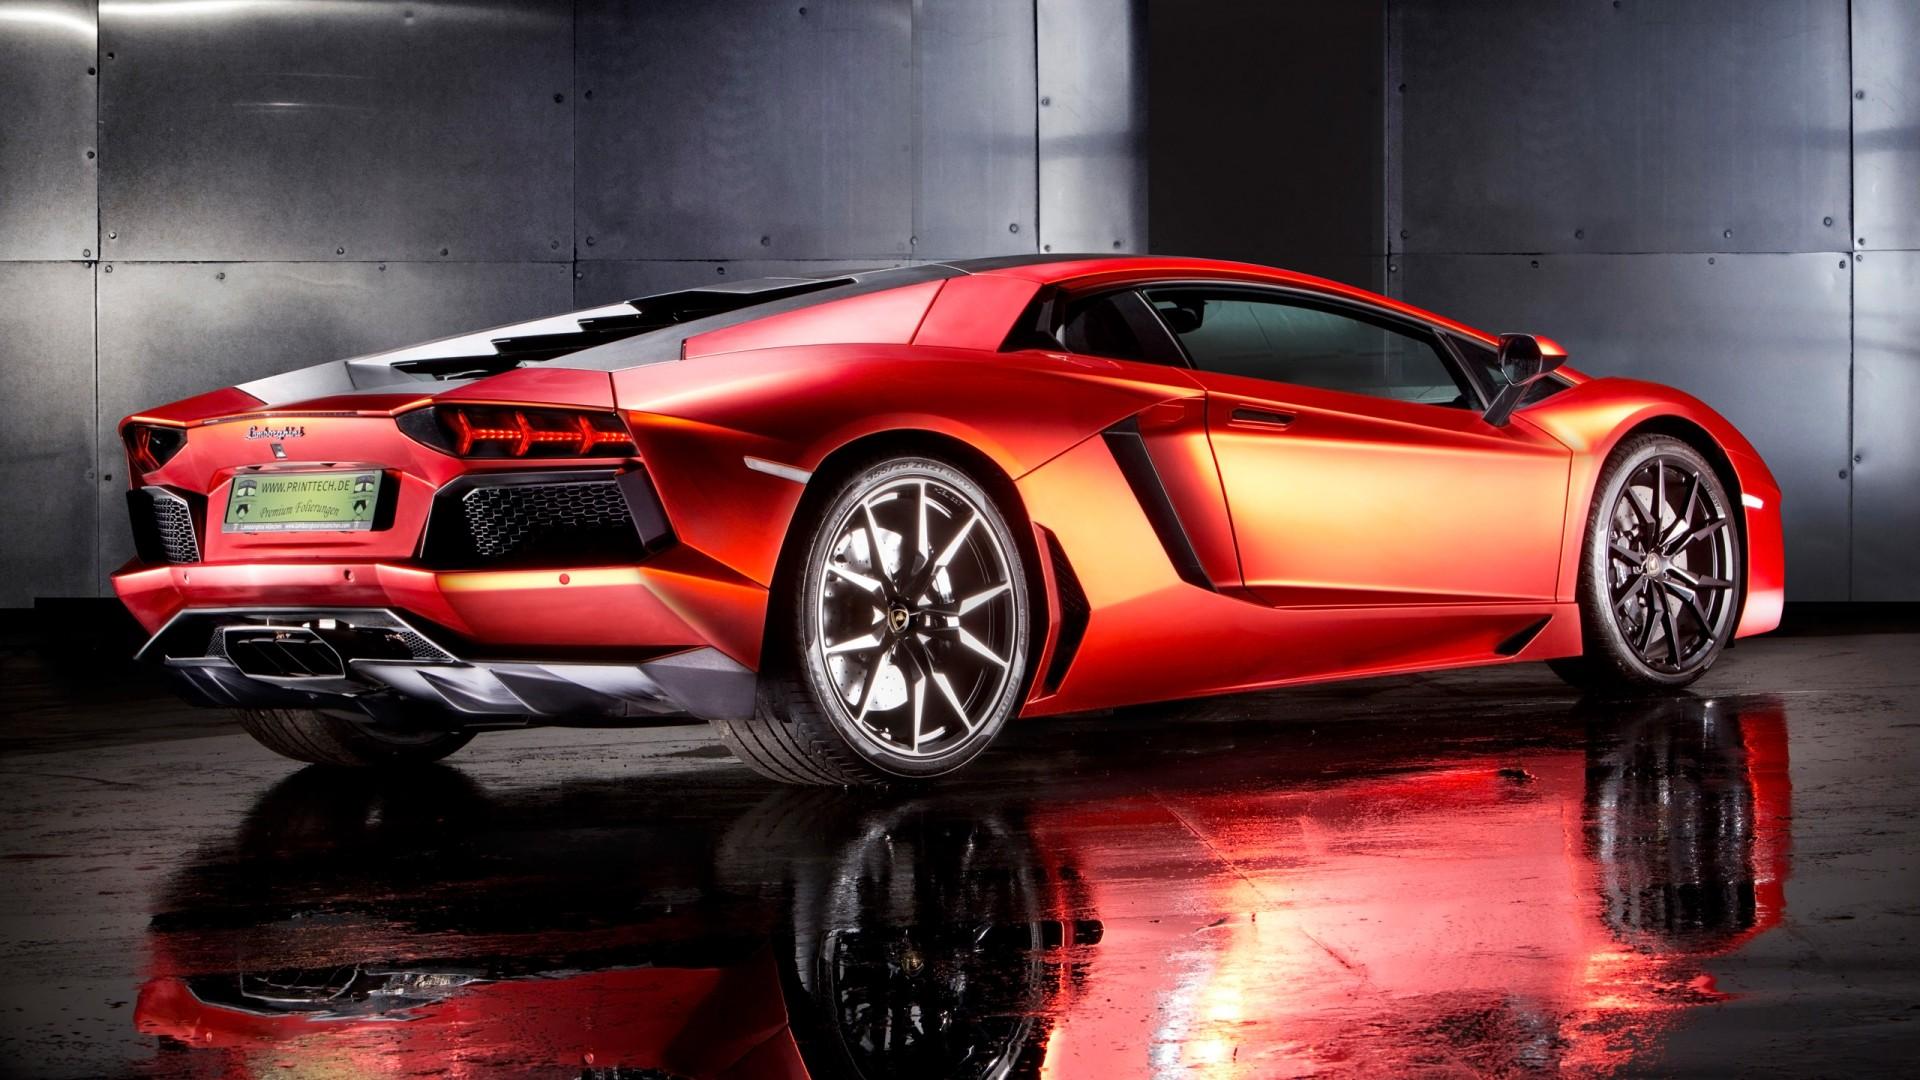 Red Jaguar Car Wallpaper Hd 2013 Lamborghini Aventador By Print Tech 2 Wallpaper Hd